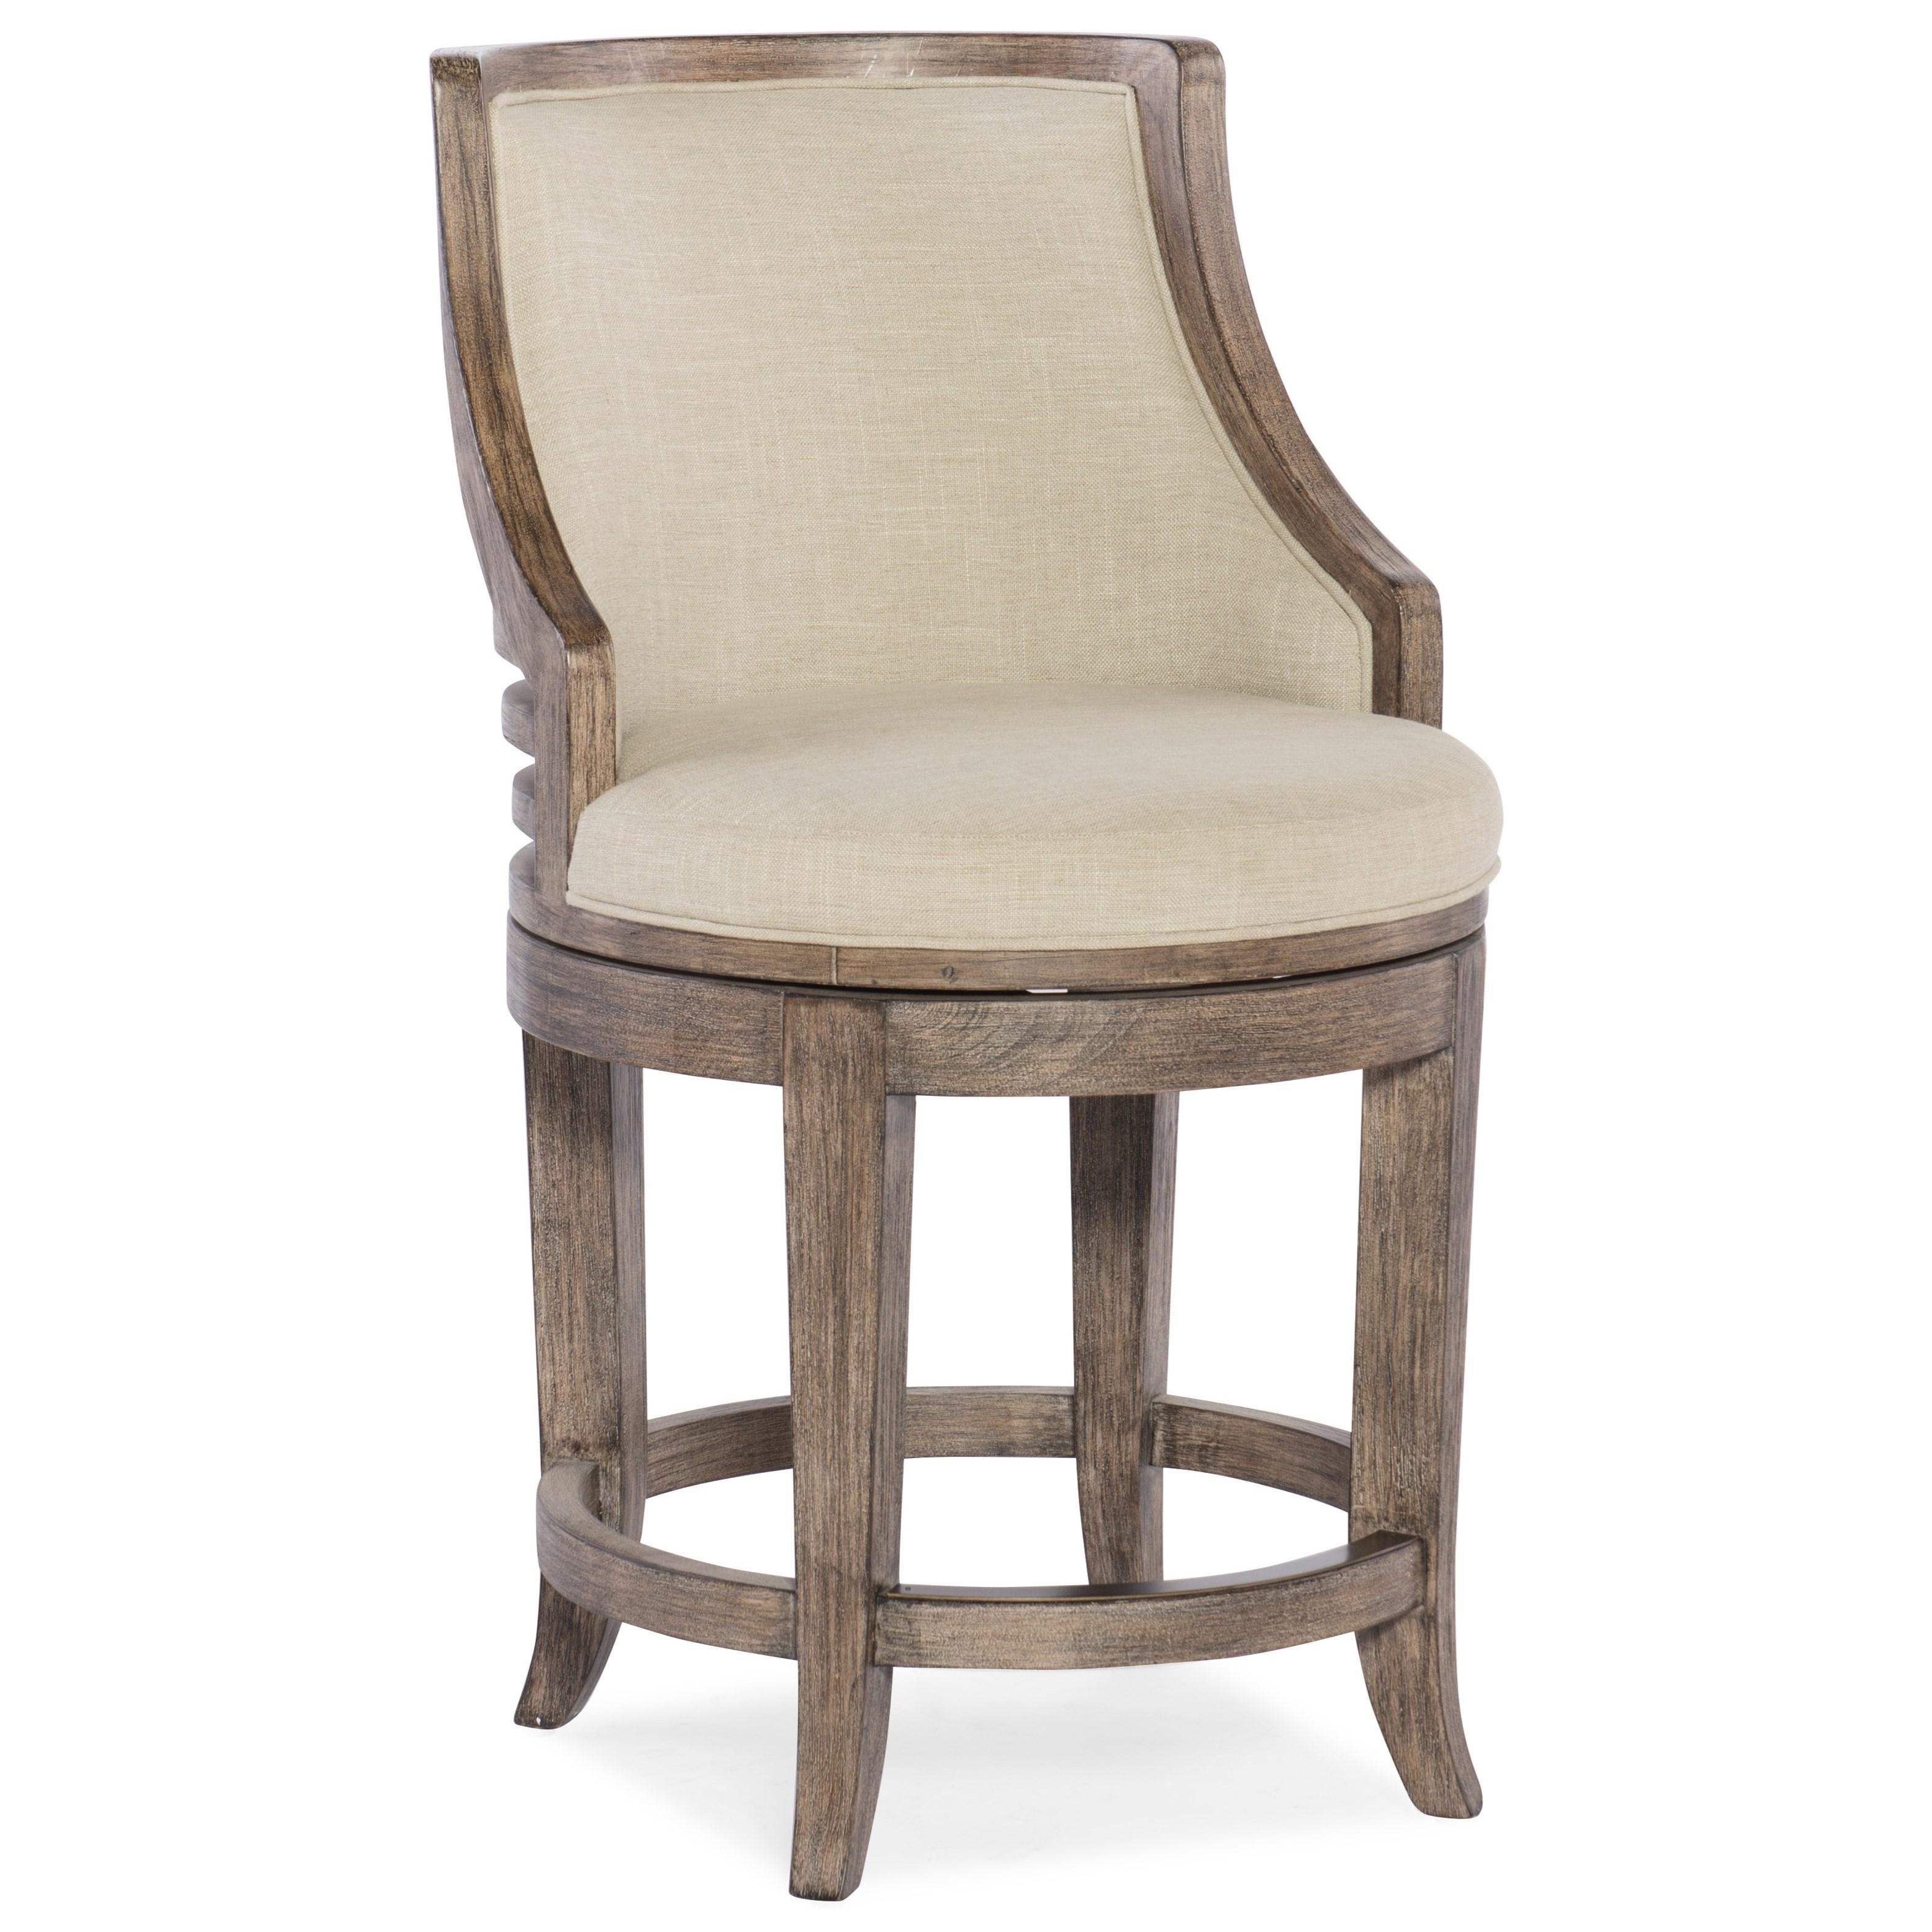 Hooker Furniture Stools Medium Lainey Transitional Swivel